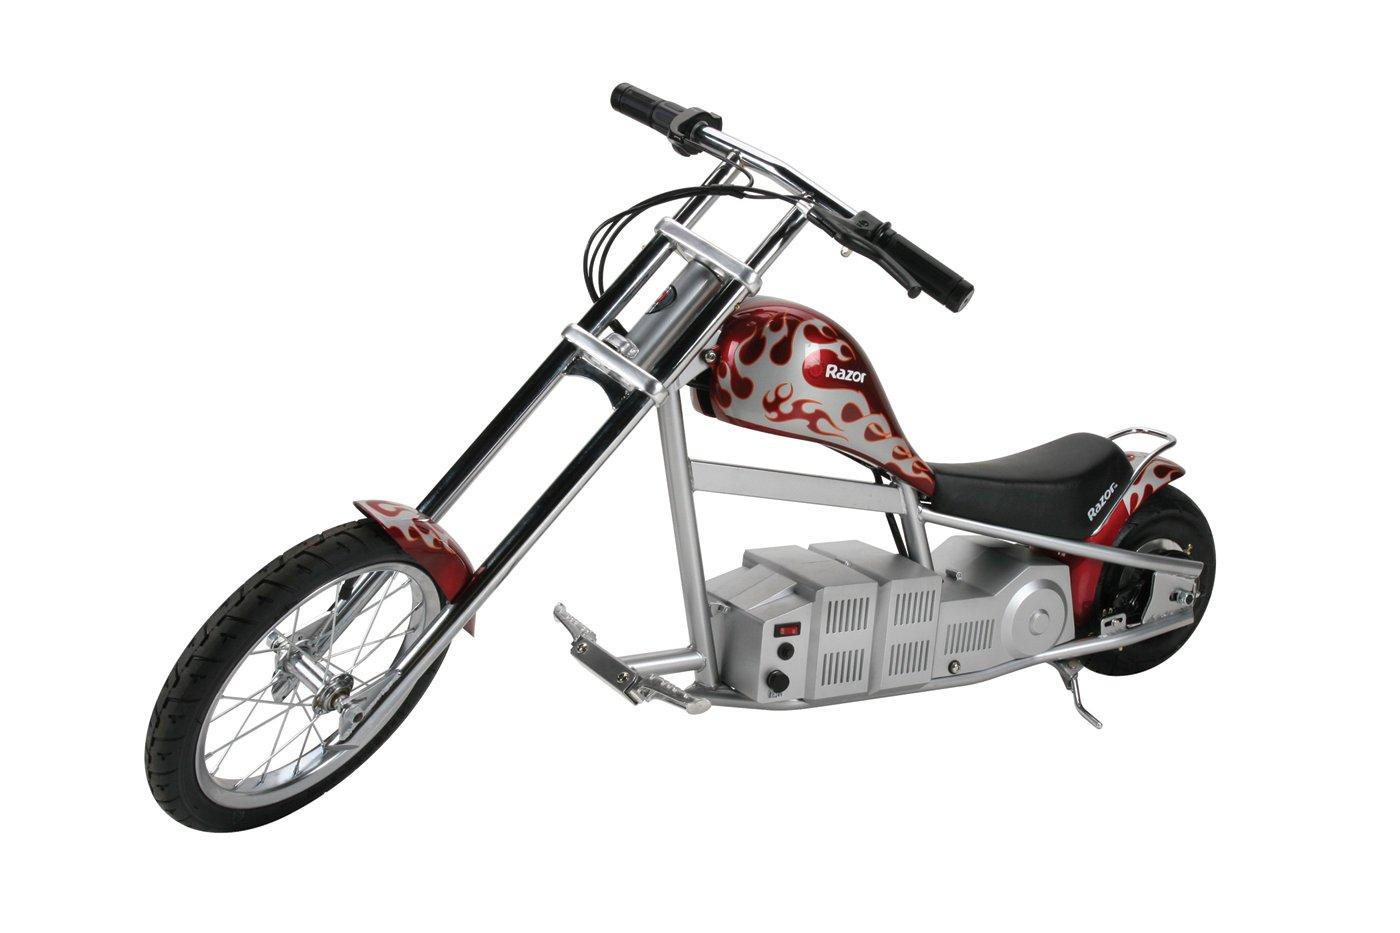 Razor Electric Chopper C300 Wiring Diagram Amazon Mini Bike Red Sports Outdoors 1400x933